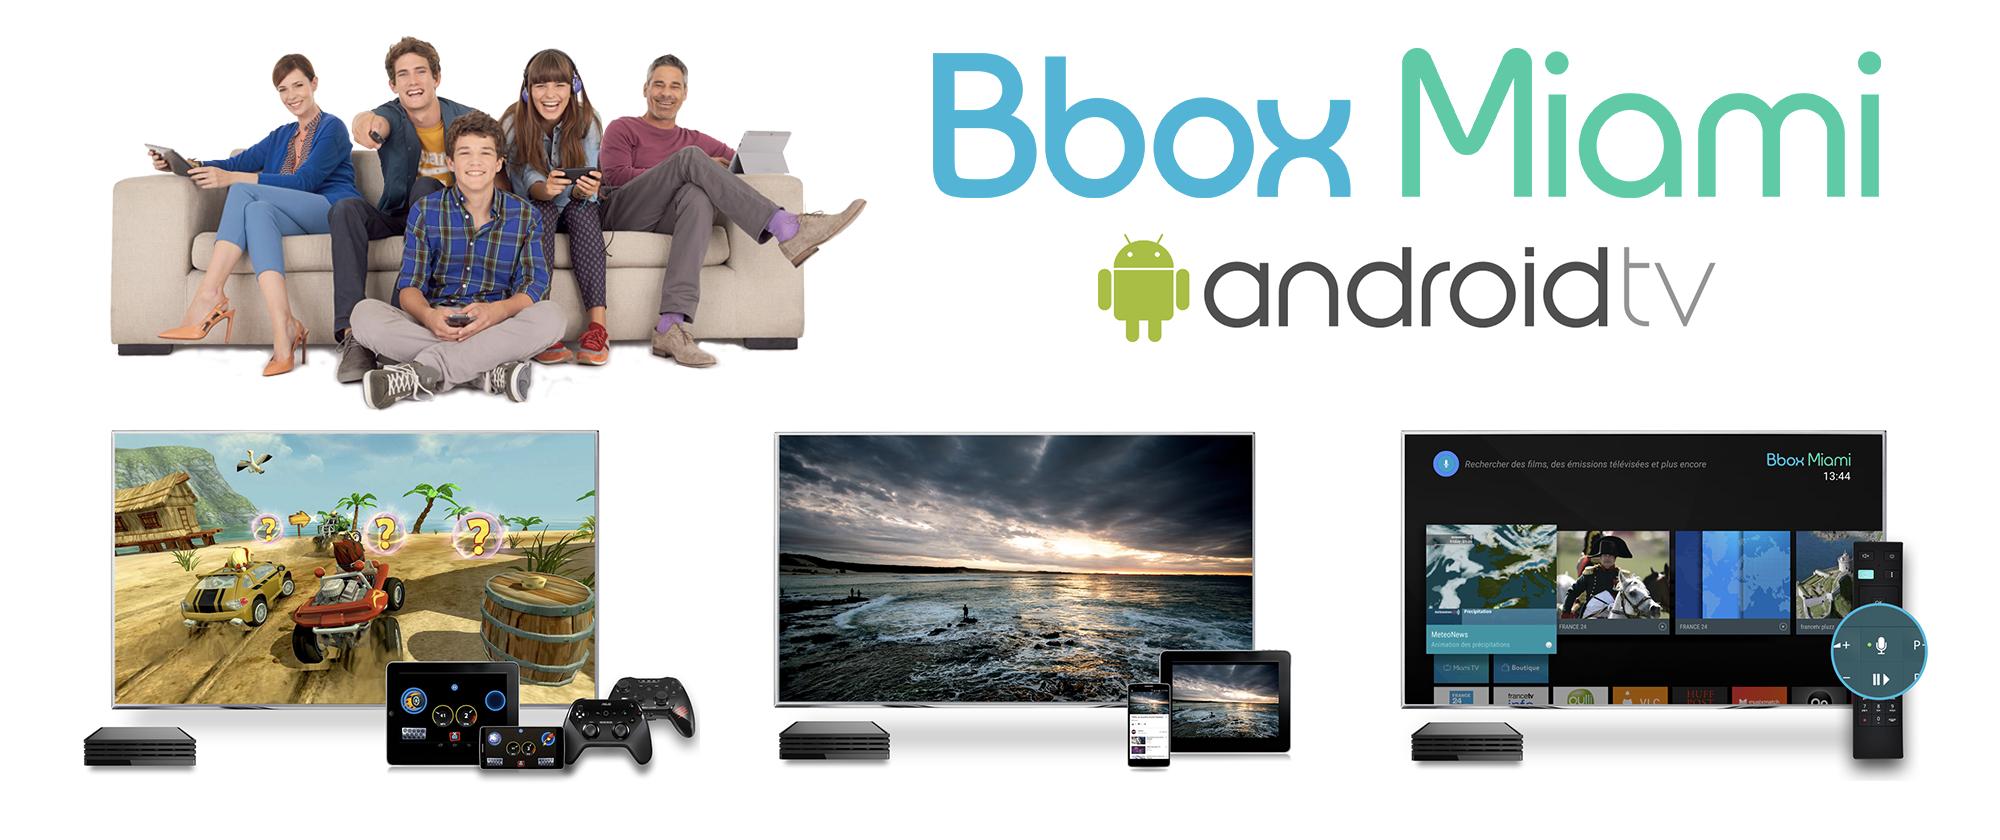 bouygues telecom lance la b ta d 39 android tv pour sa bbox miami frandroid. Black Bedroom Furniture Sets. Home Design Ideas